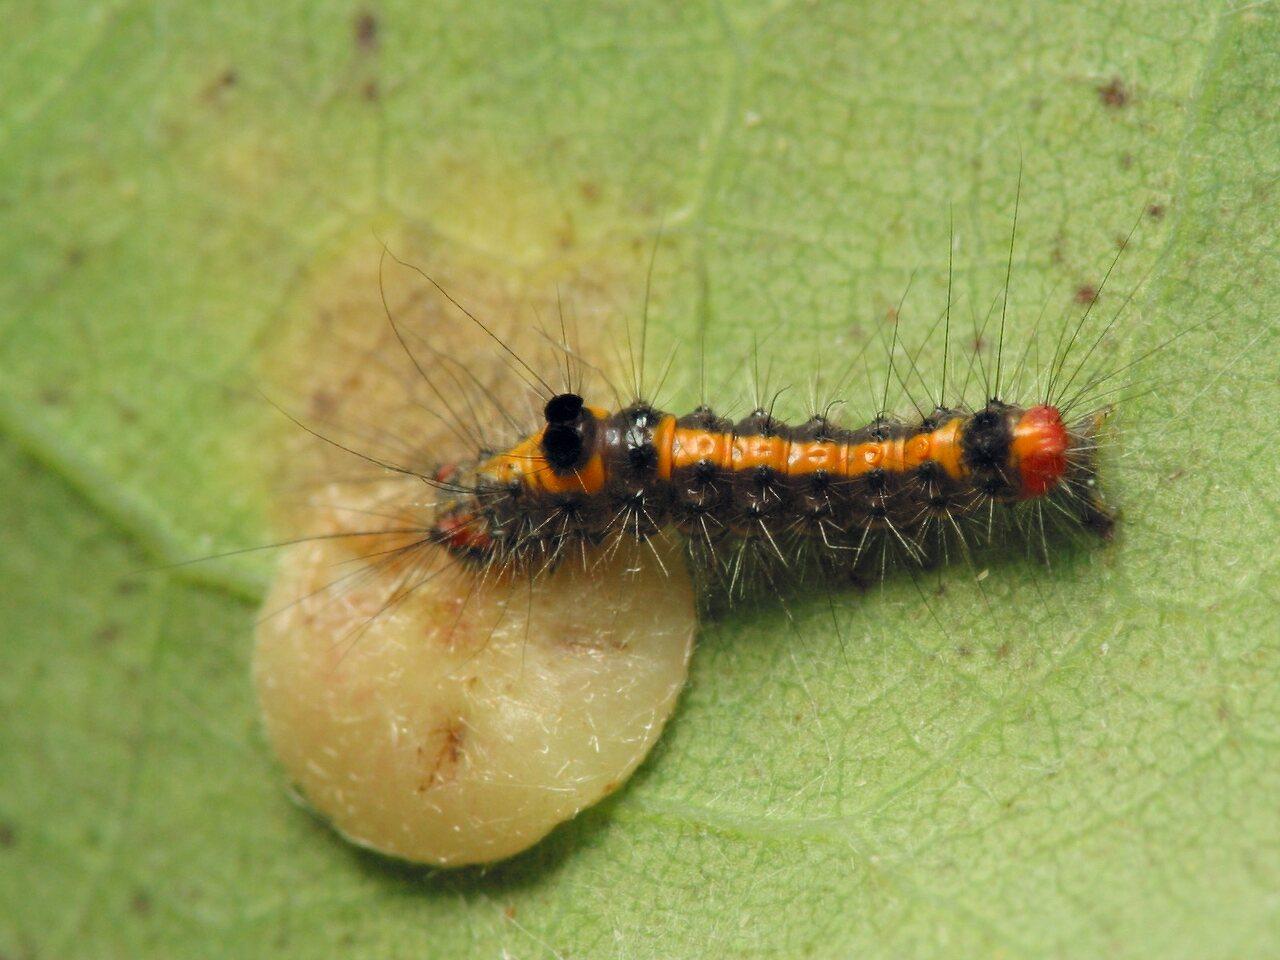 Euproctis-similis-6610.jpg